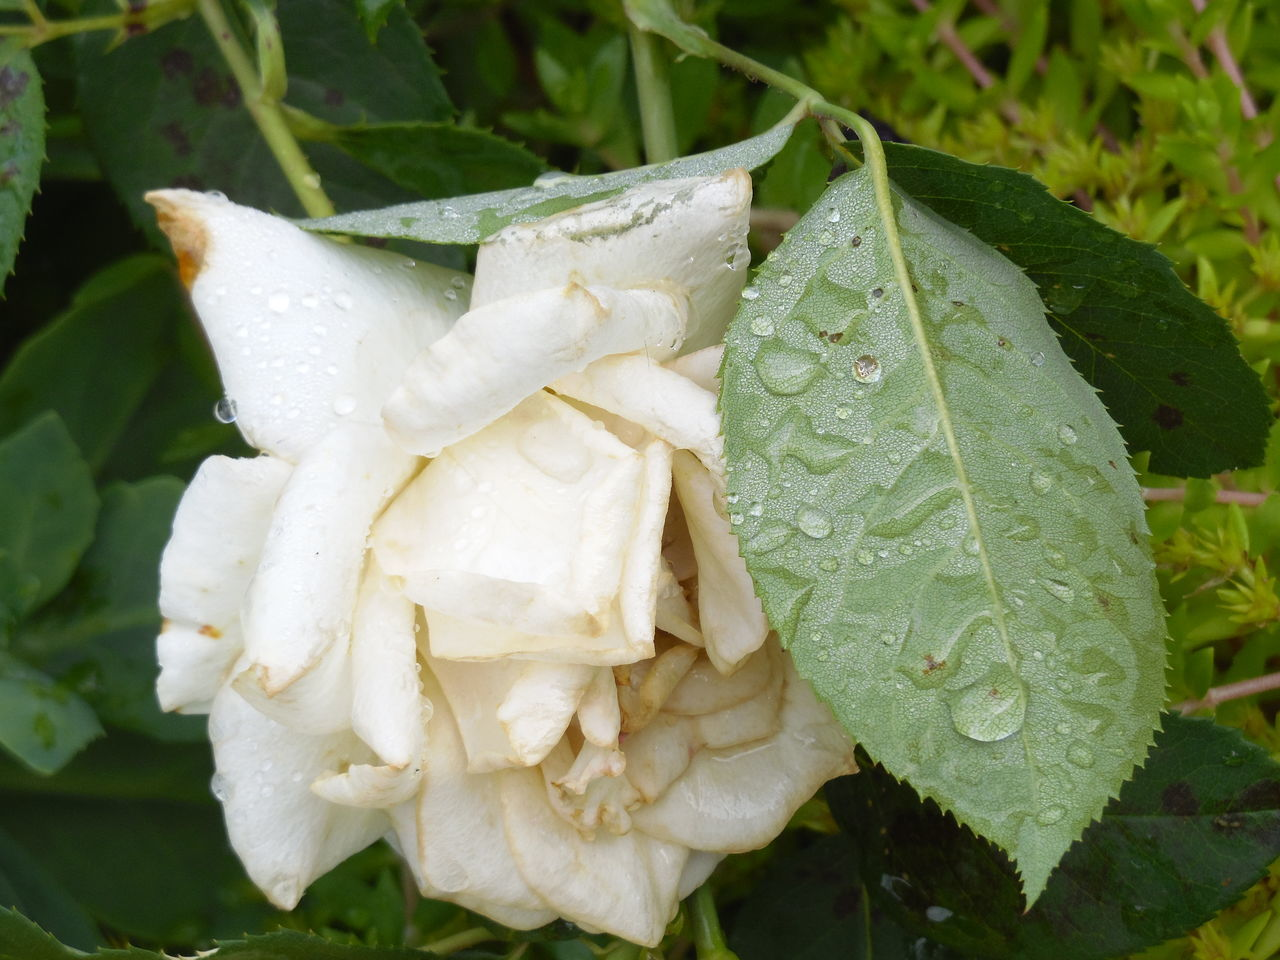 In Wentzville Missouri Flower Head Fragility Botany Softness Selective Focus Flower Green Color